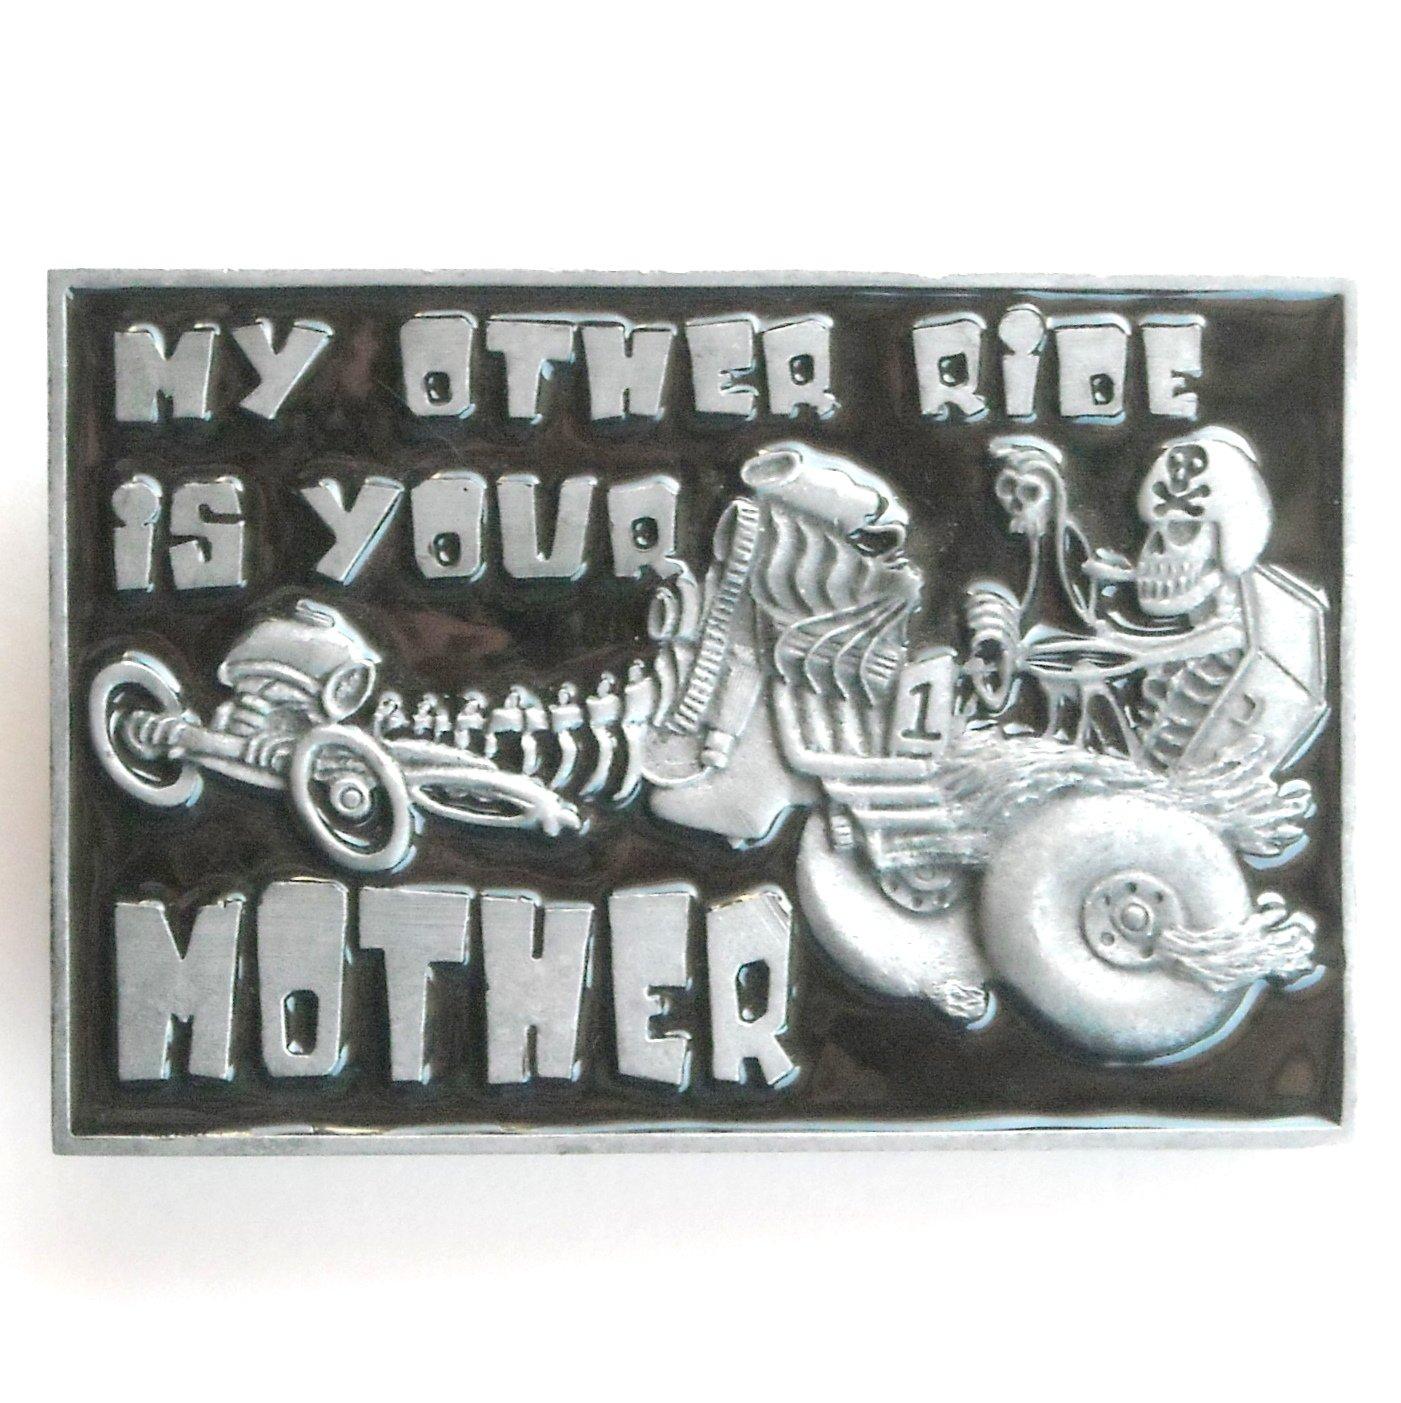 My Other Ride Is Your Mother Heavy Metal Black Enamel Belt Buckle